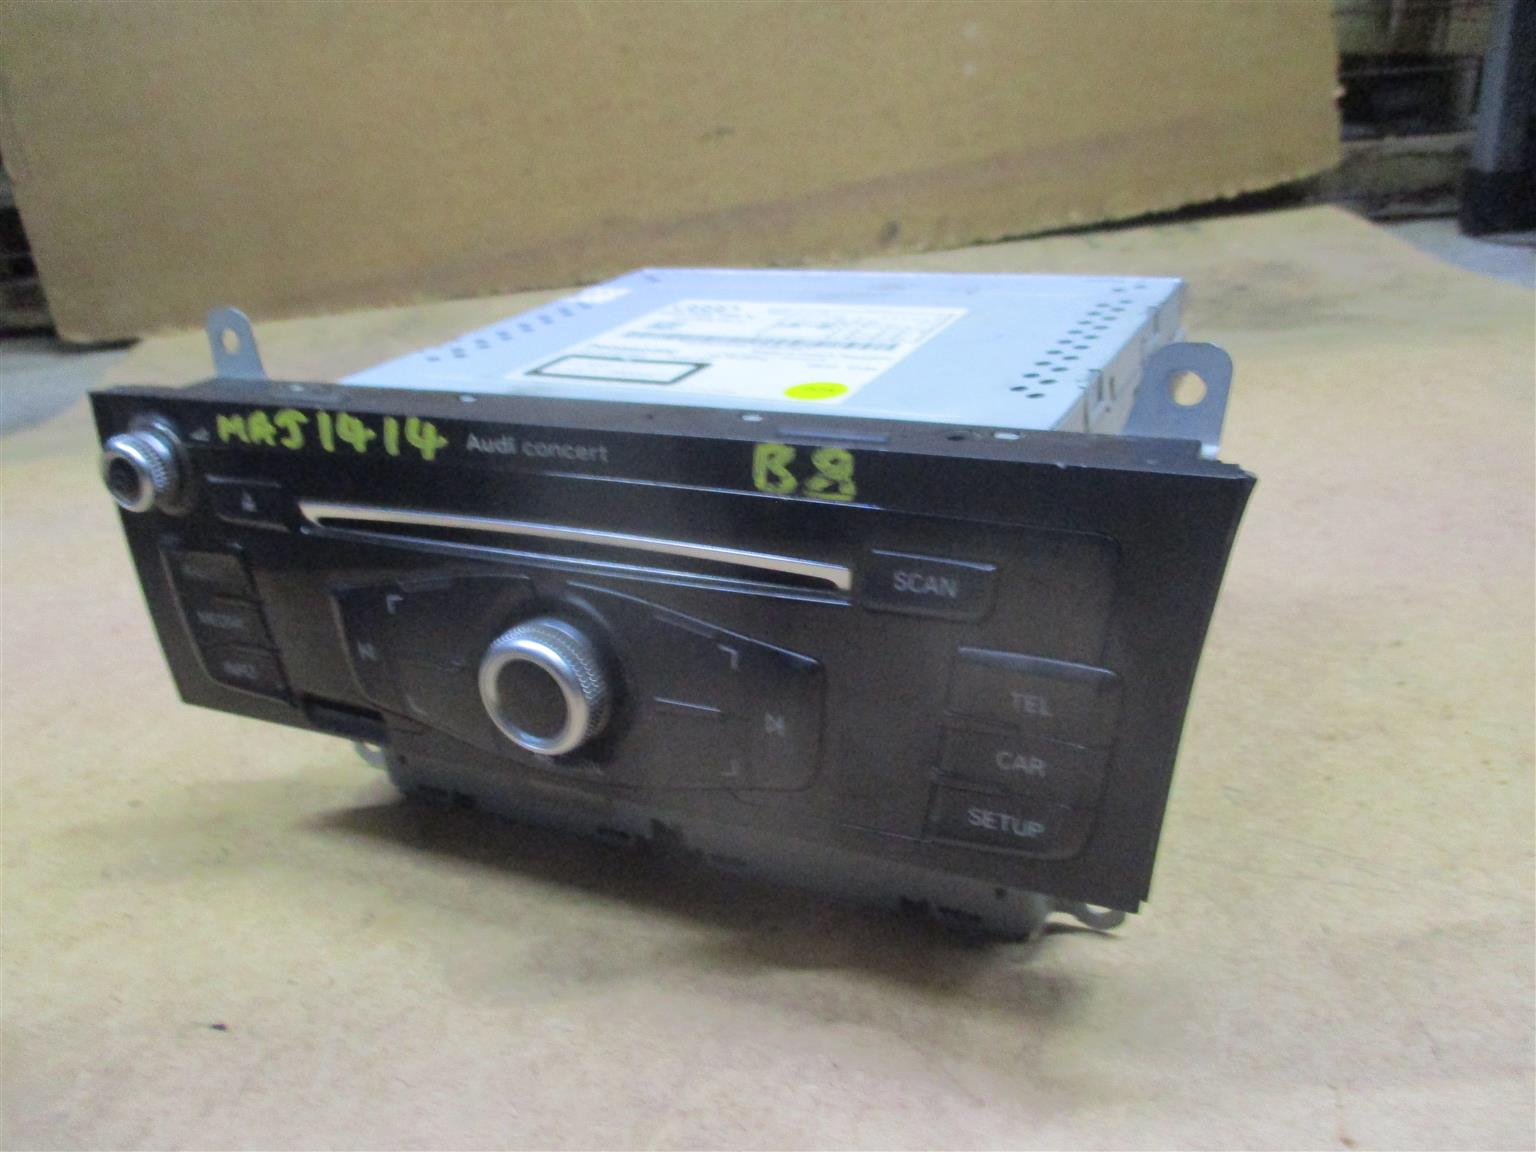 AUDI B8 CAR RADIO